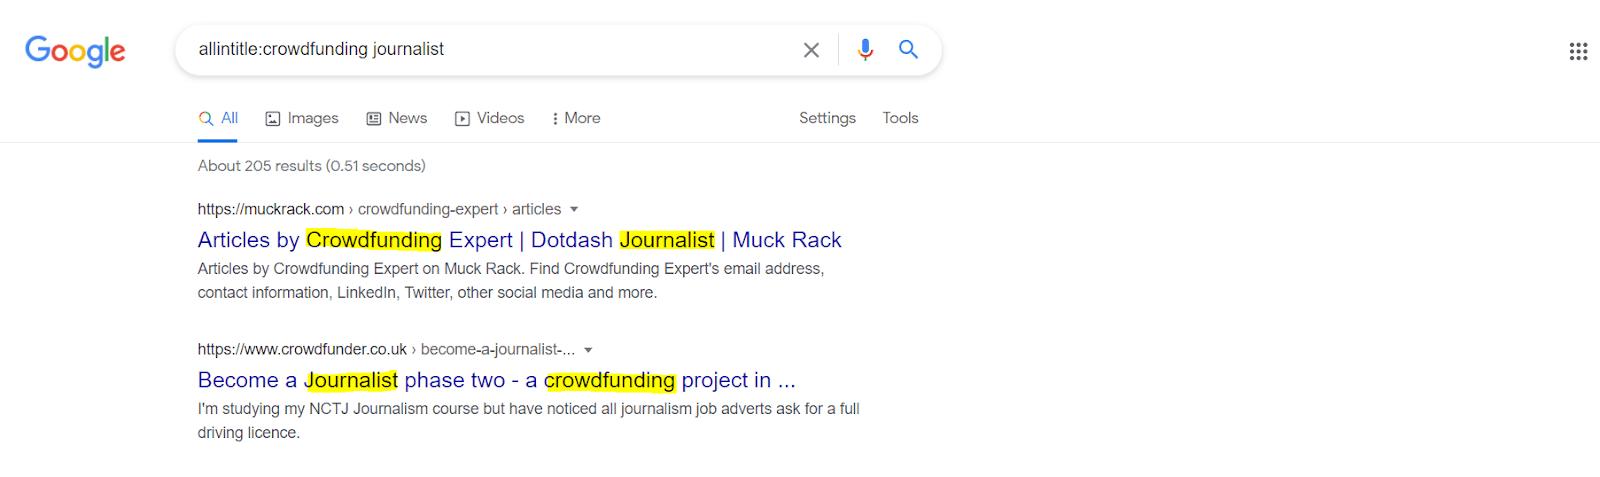 crowdfunding journalist